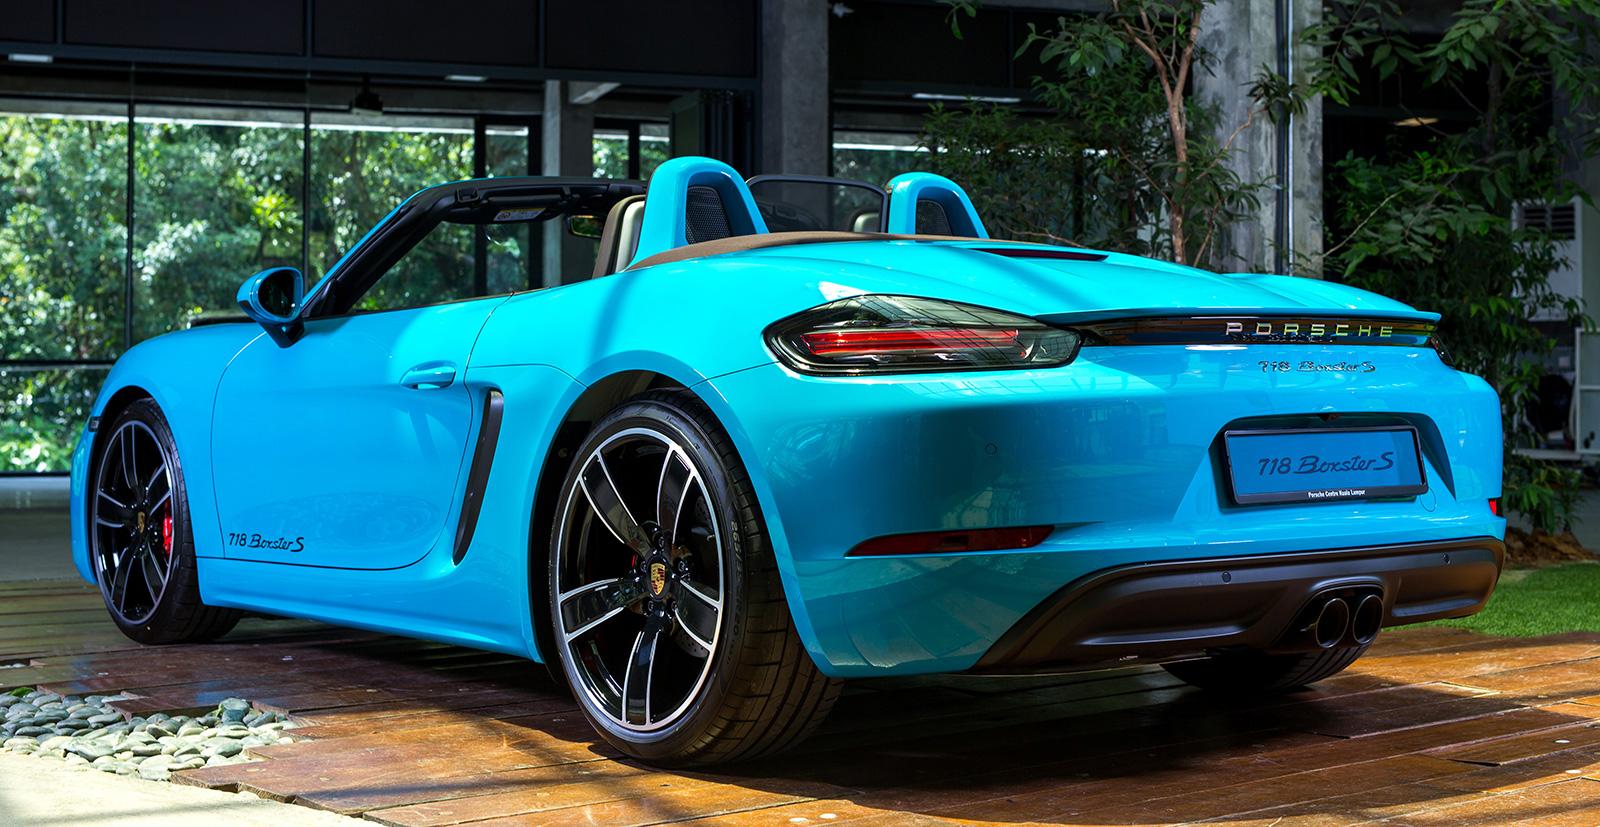 Porsche 718 Boxster登陆大马市场,价格从rm480k起! Porsche 781 Boxster